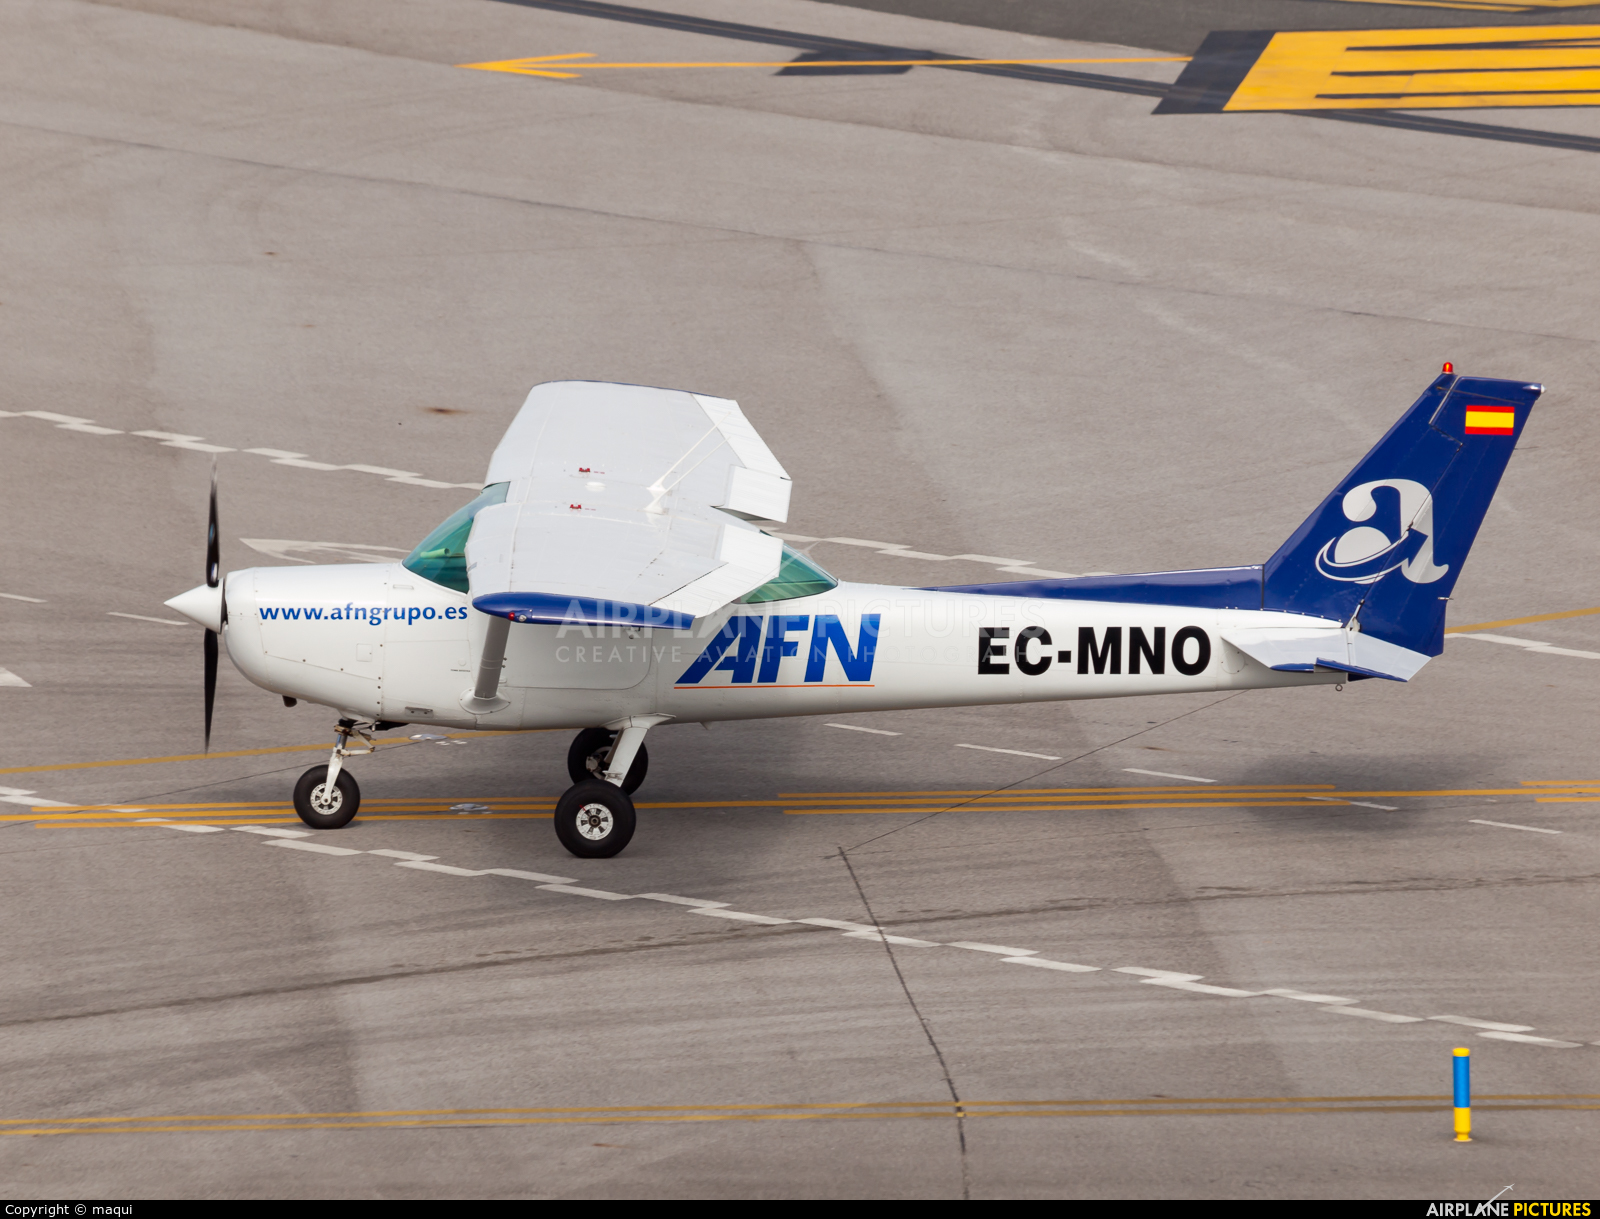 Aeroflota del Noroeste EC-MNO aircraft at La Coruña